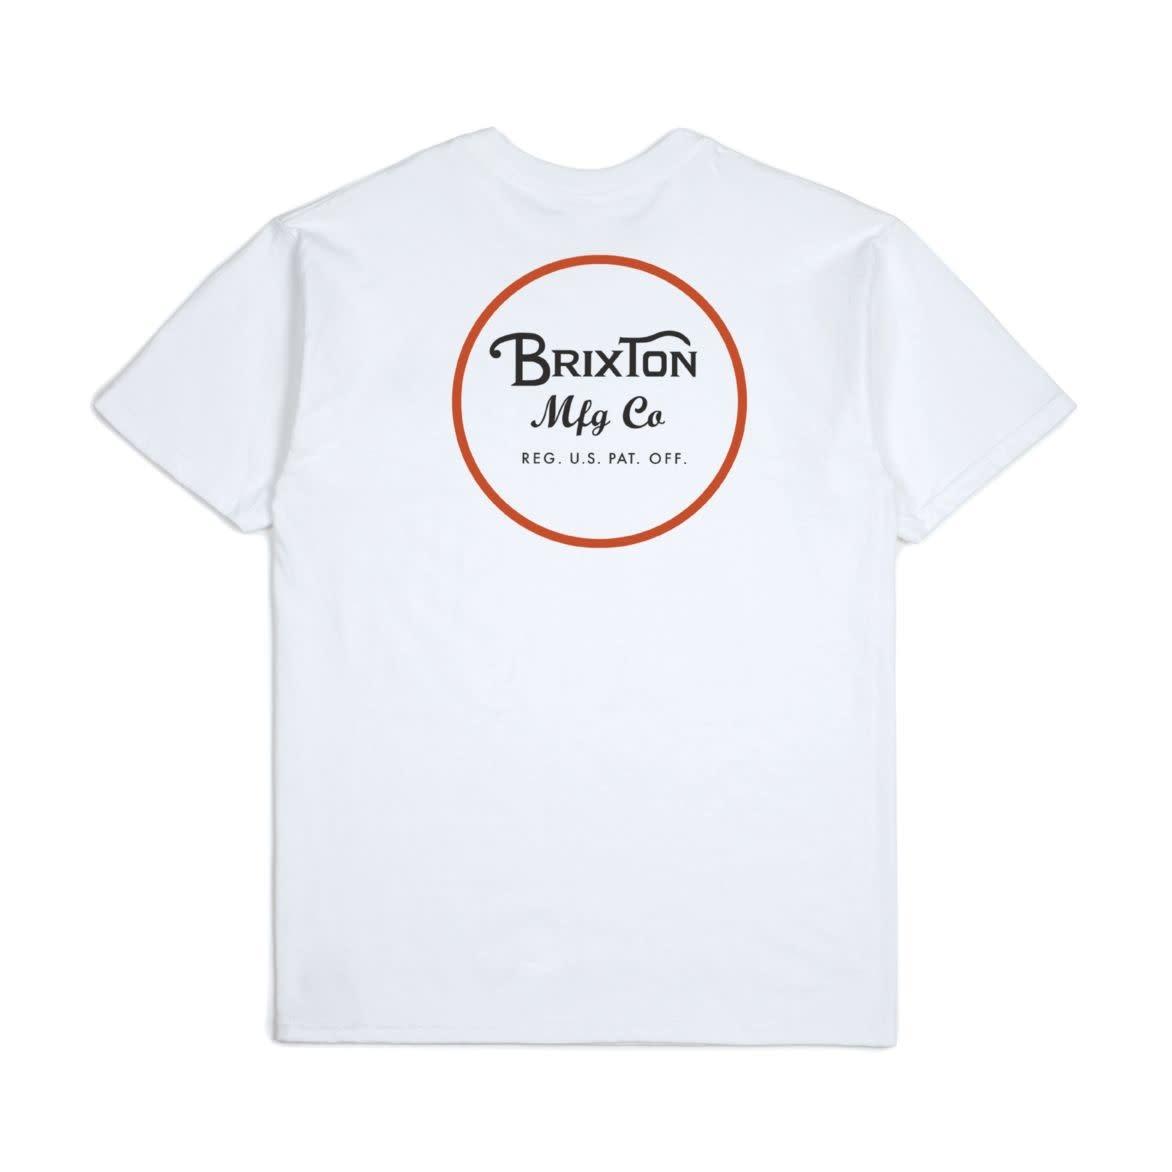 Brixton Wheeler ll Tee White/Black/Red